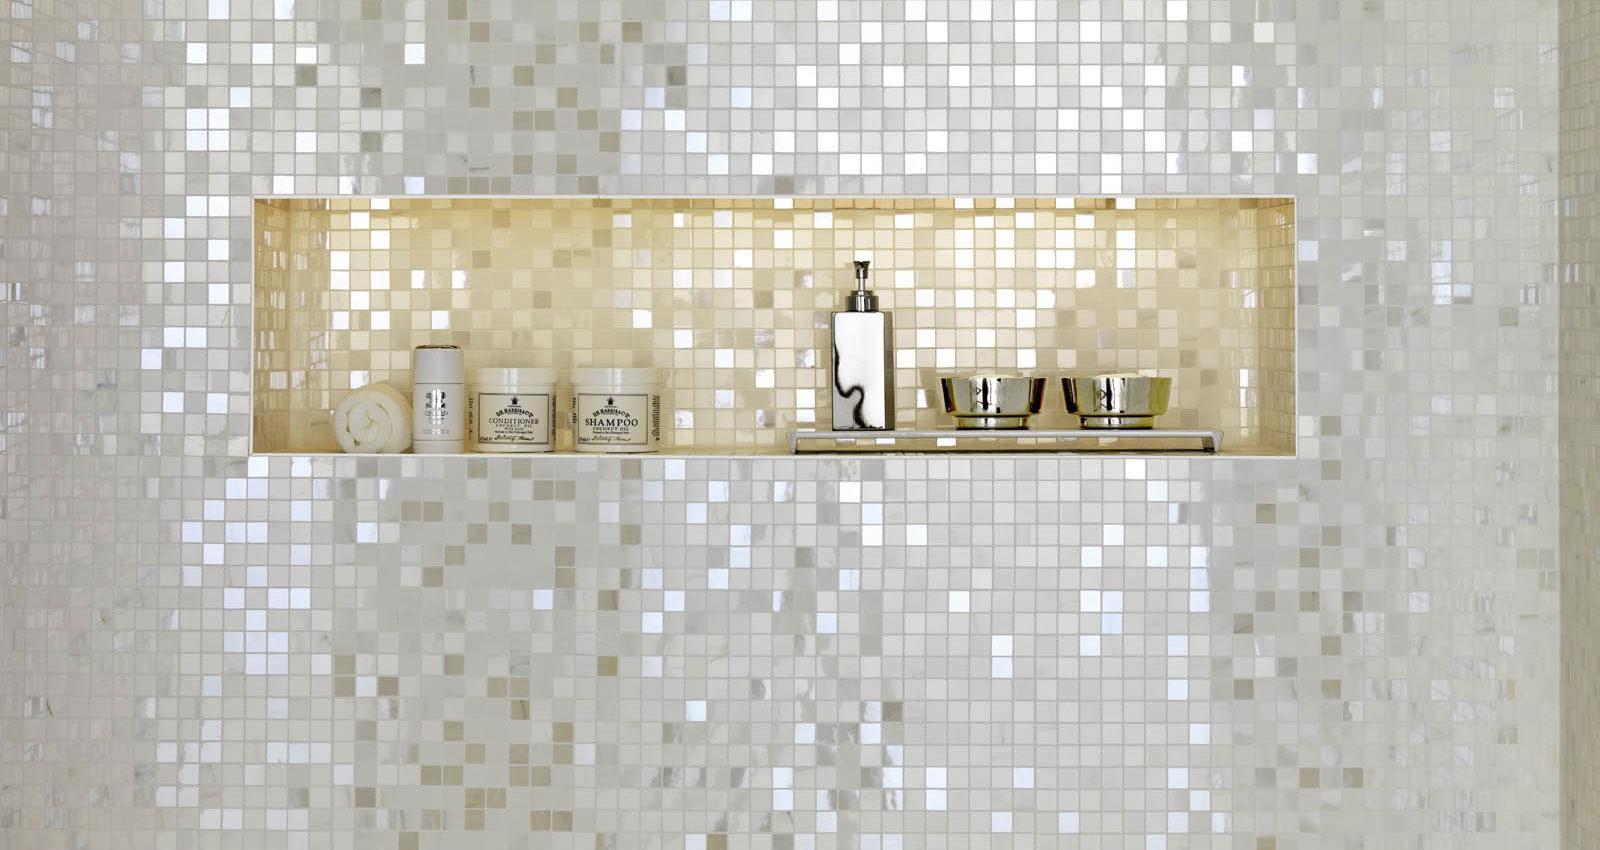 Stonevision Glossy Porcelain Marazzi Bianca Top Leux Studio Silver L Marble Effect Bathroom